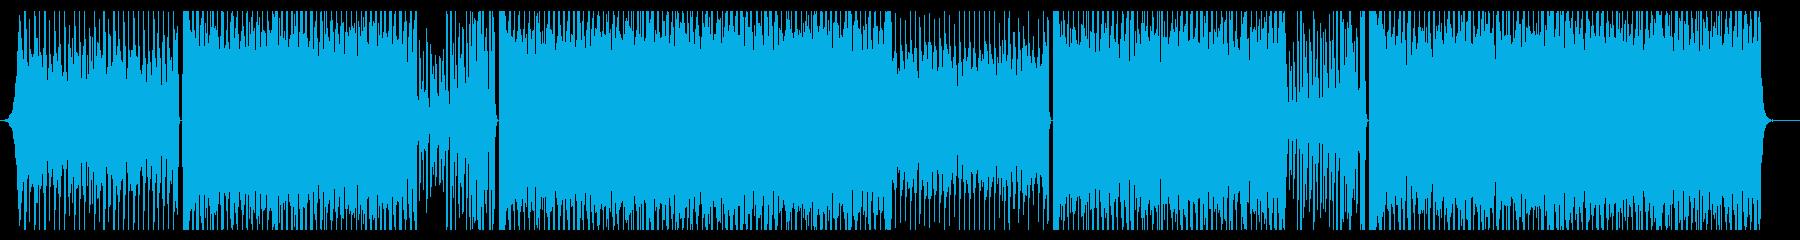 Marksmanの再生済みの波形